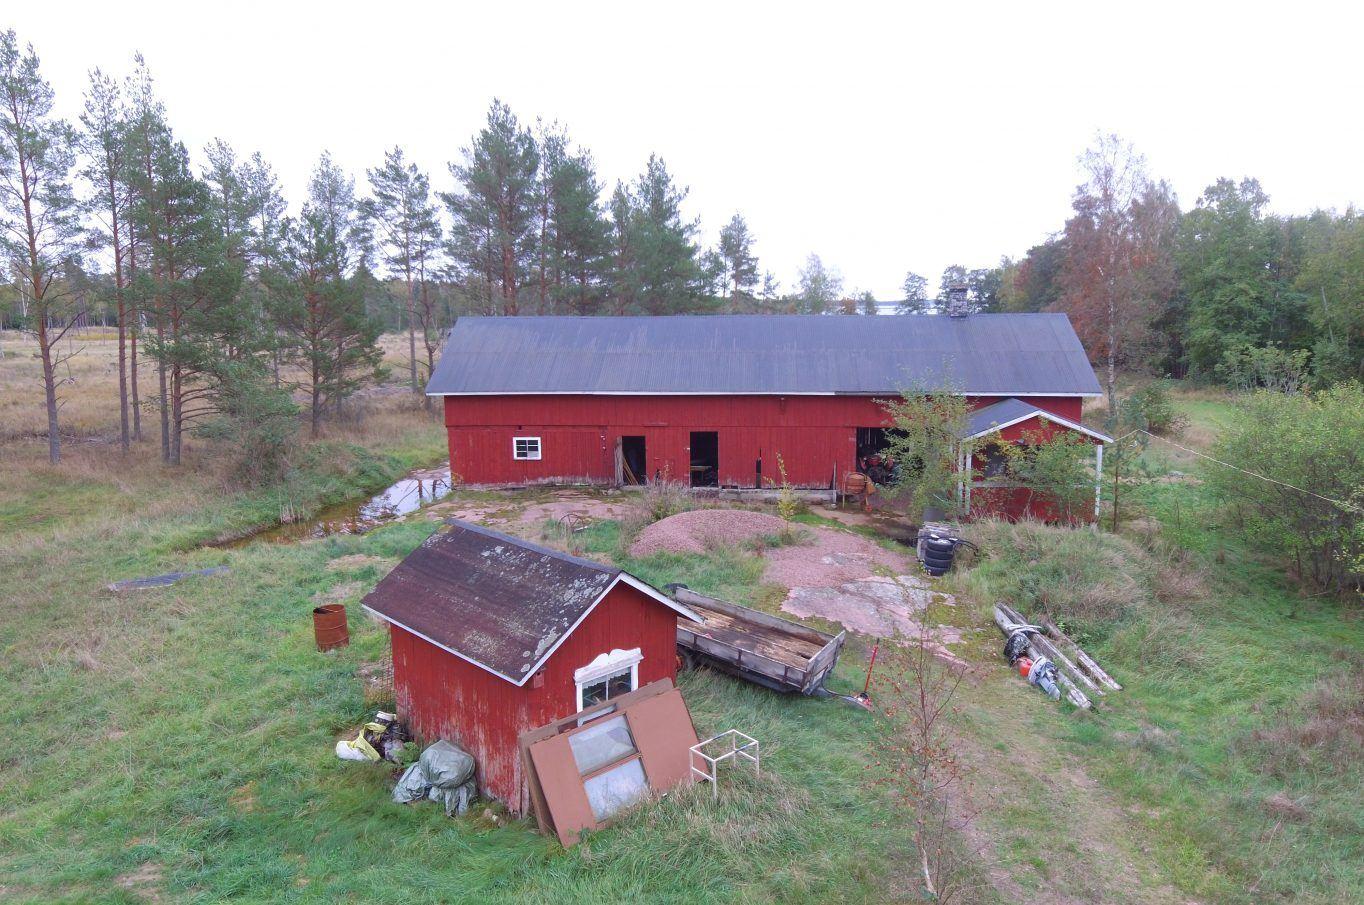 Bostadshus med ladugård i Flaka, Lemland